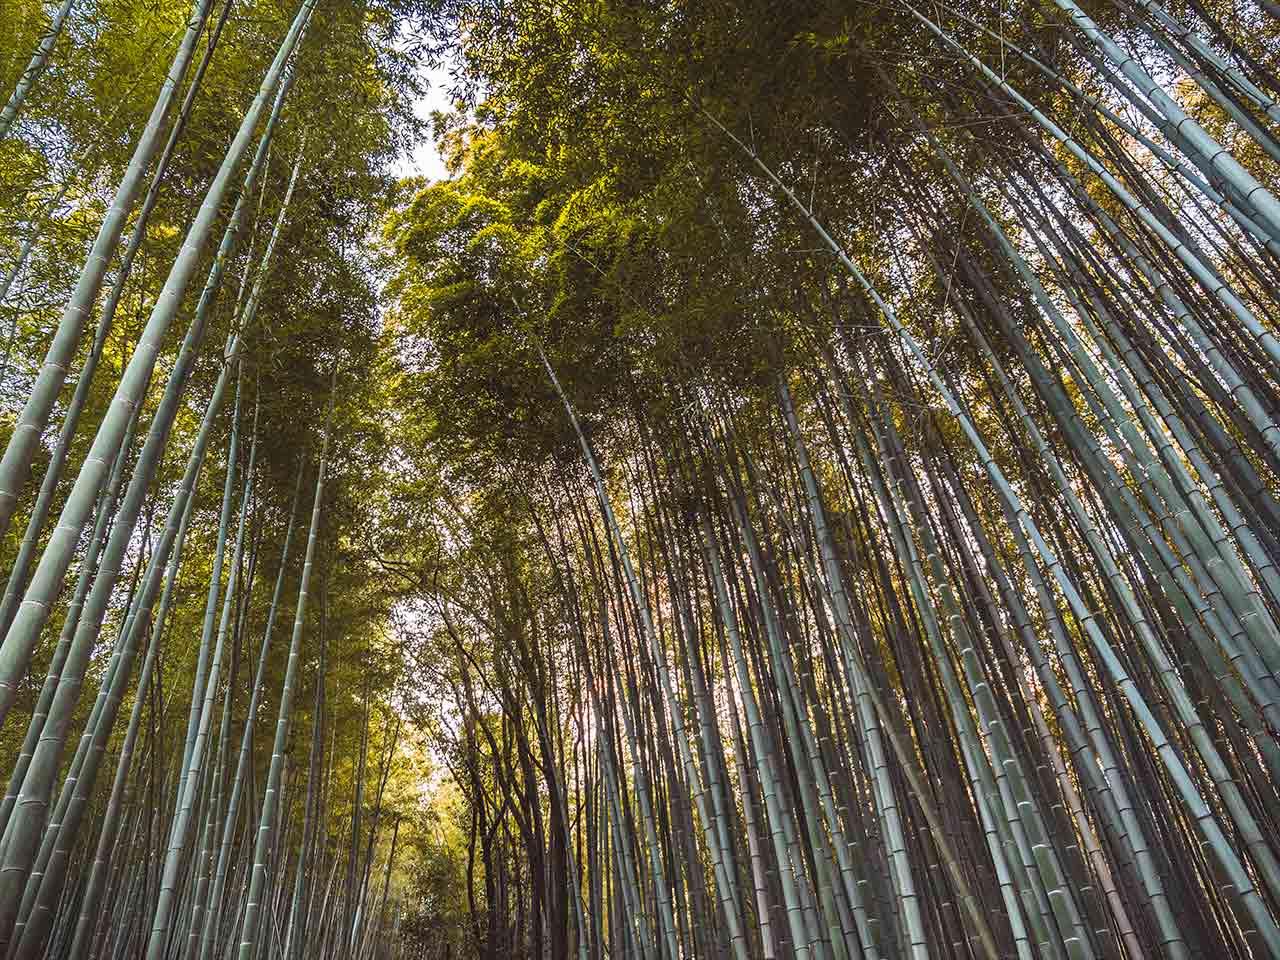 Arashiyama Bambuswald in Kyoto Japan